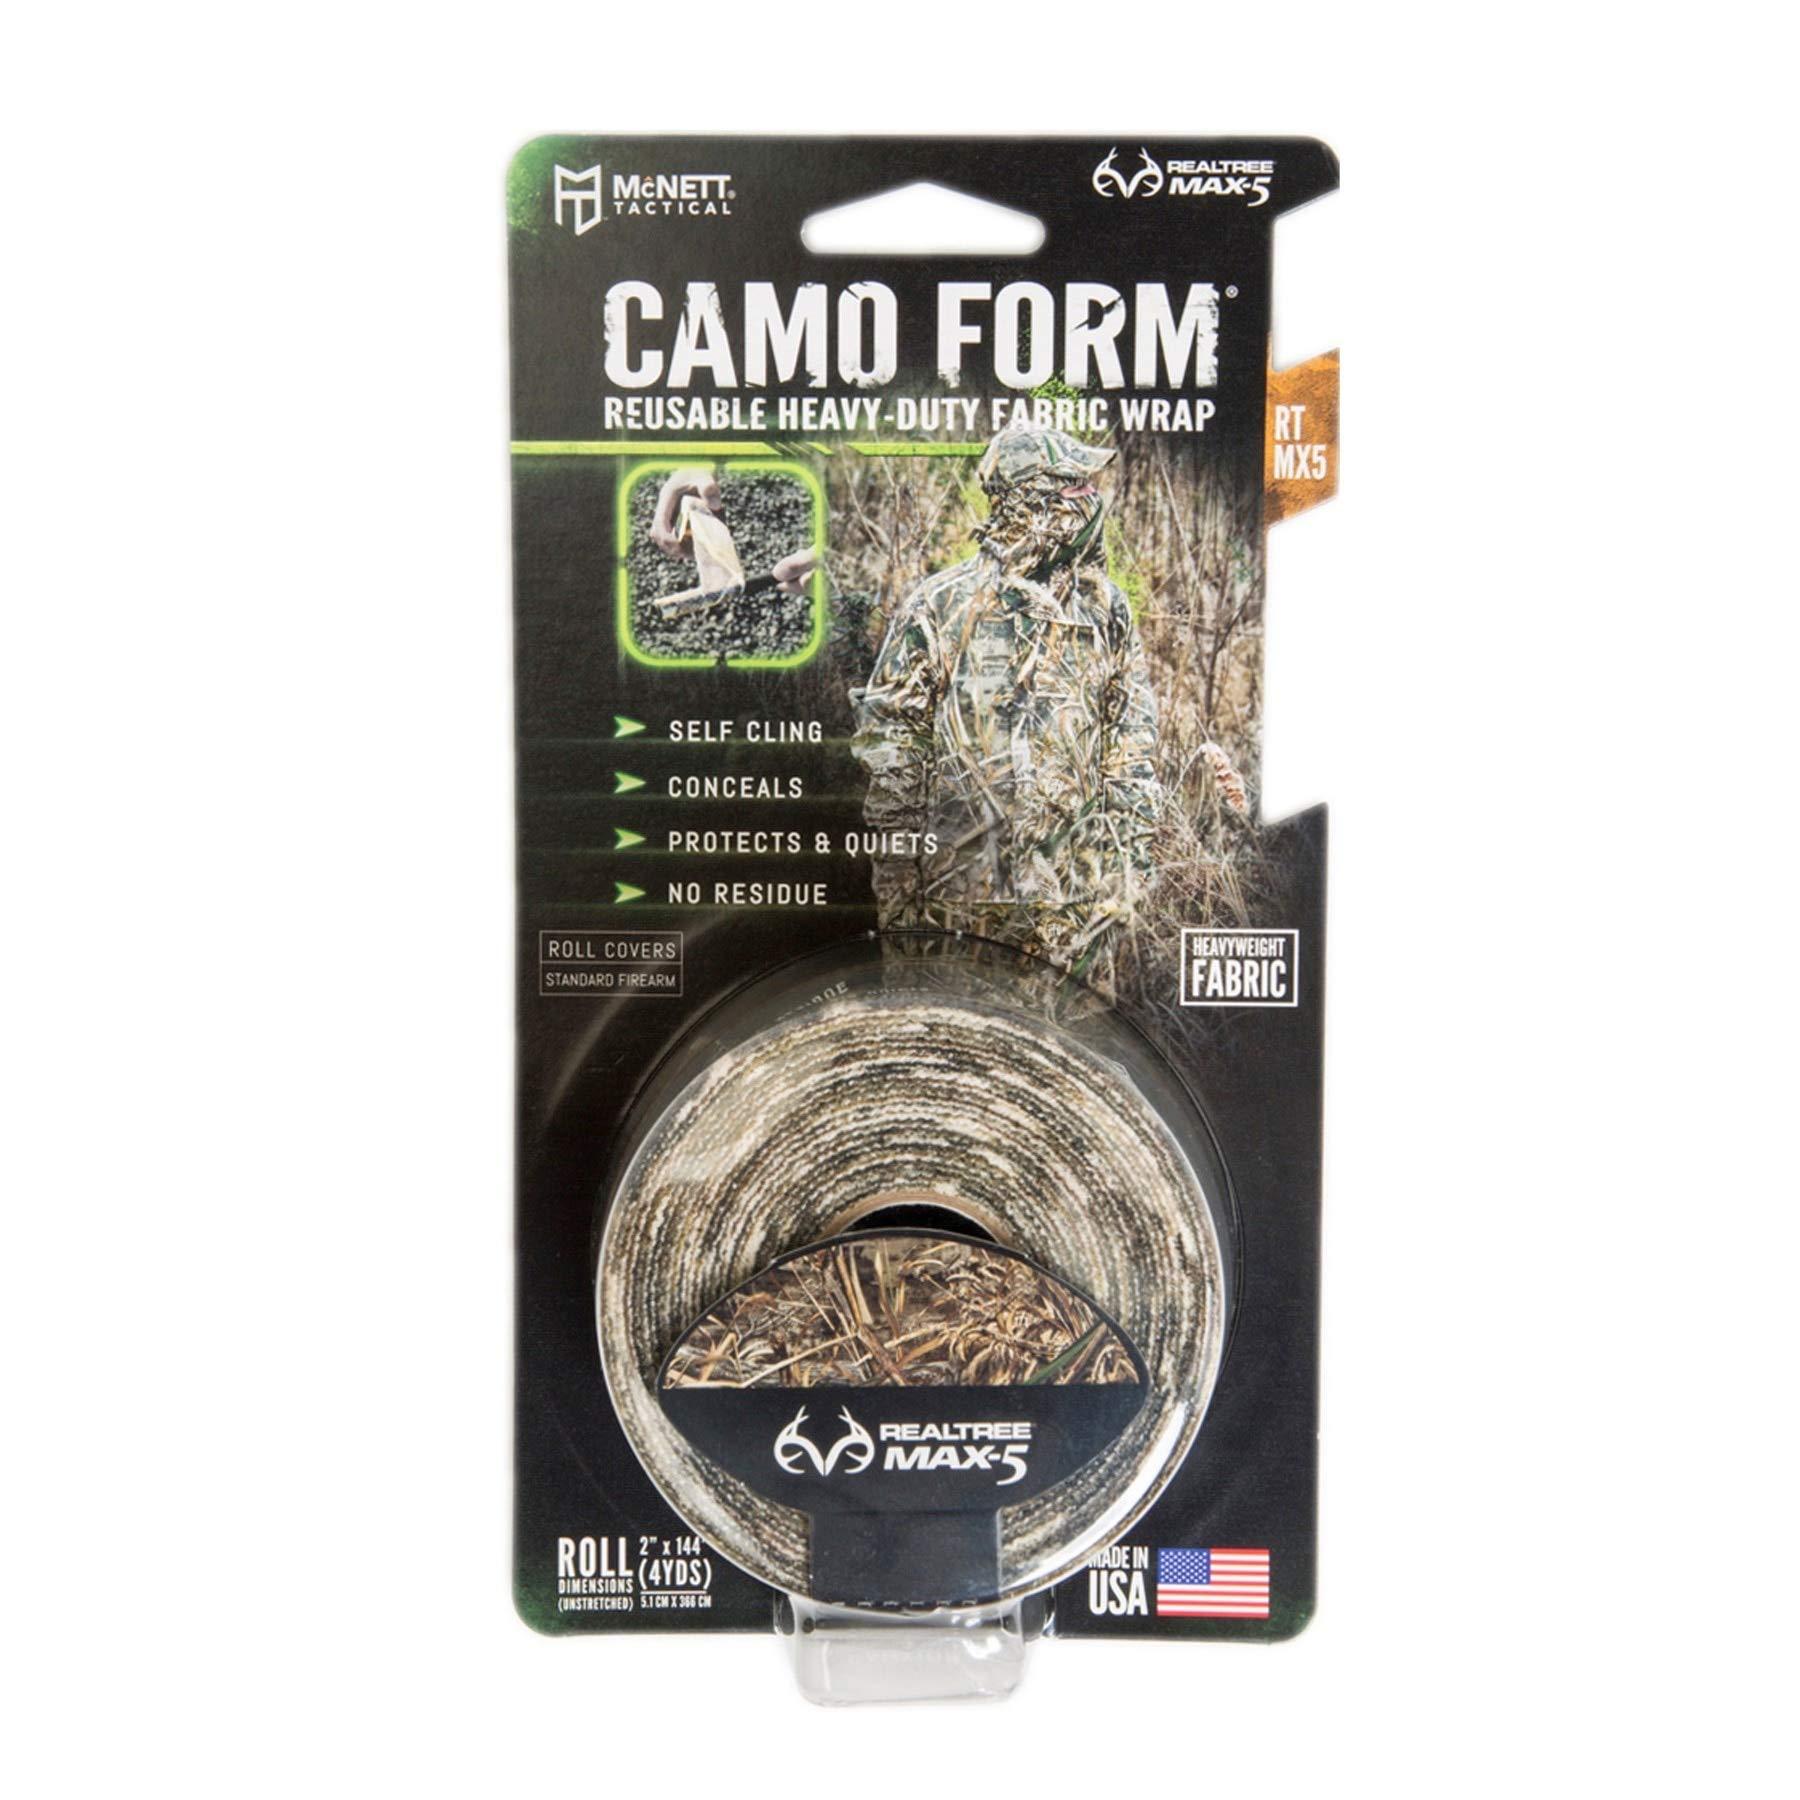 McNett Tactical Camo Form Reusable Heavy-Duty Fabric Wrap Realtree Max 5